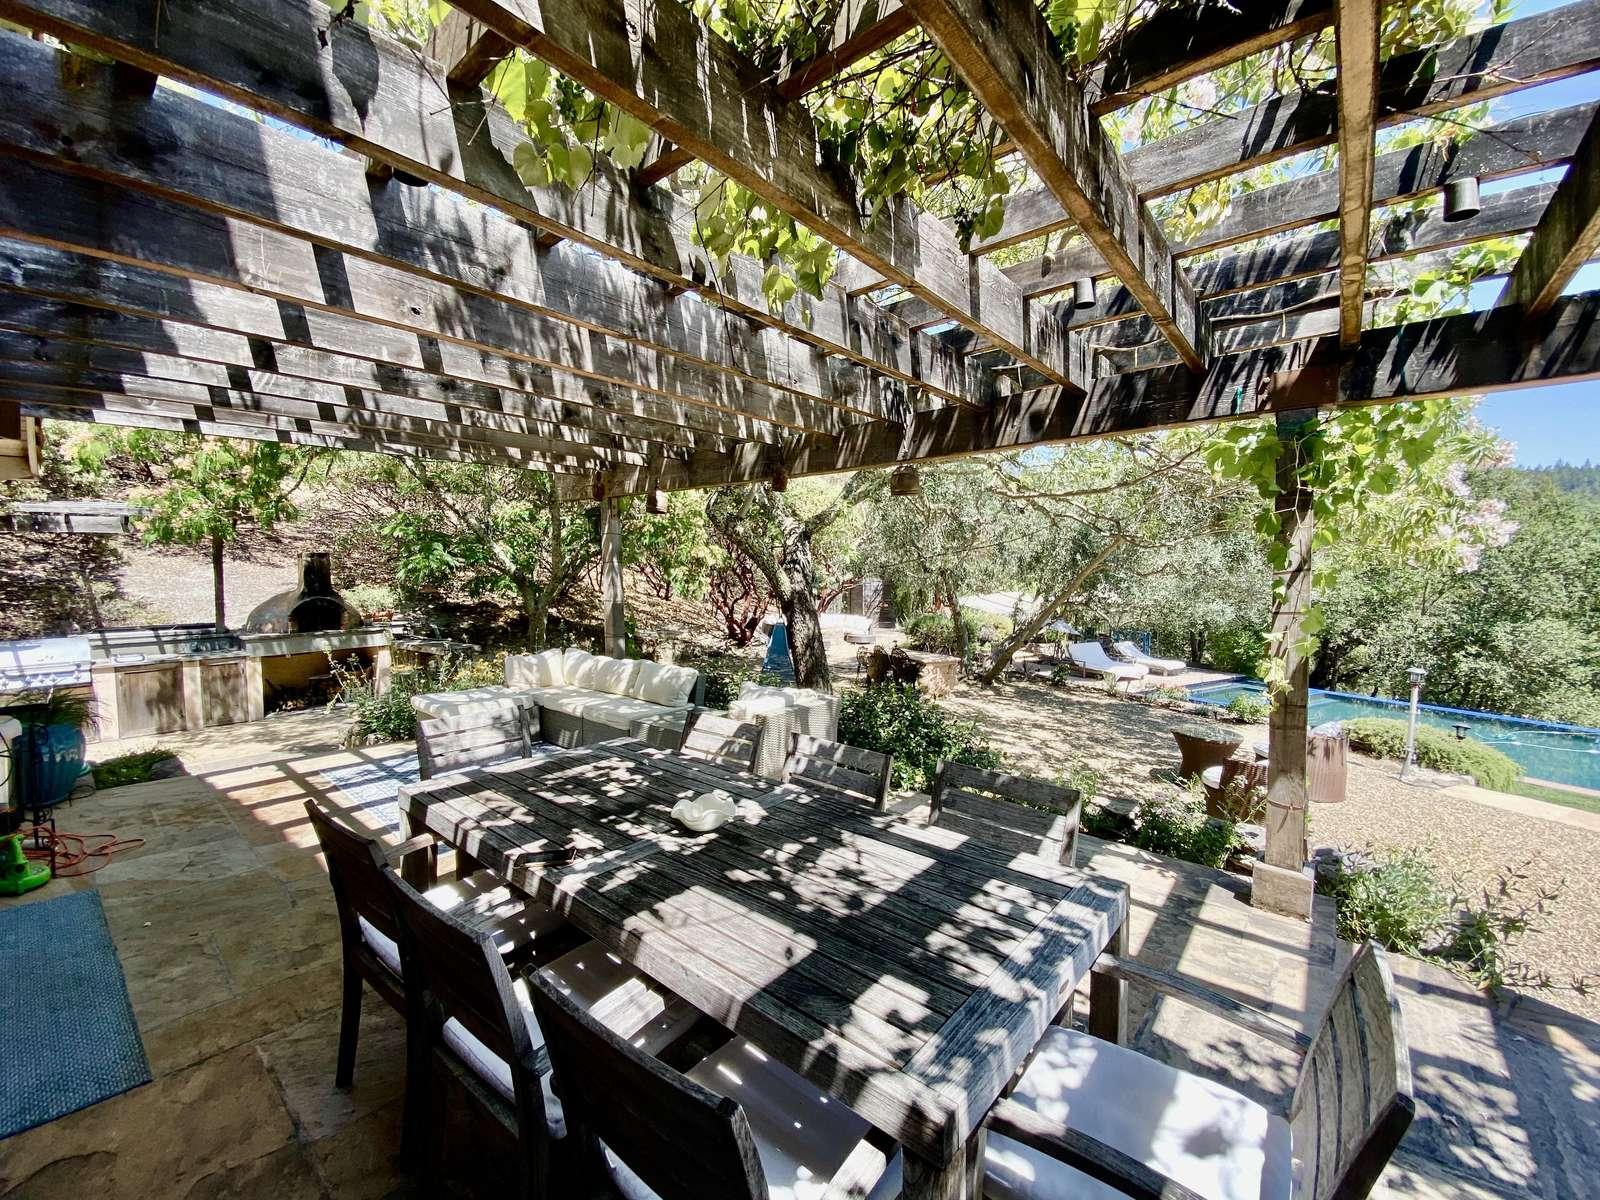 Outdoor dining under the trellised loggia